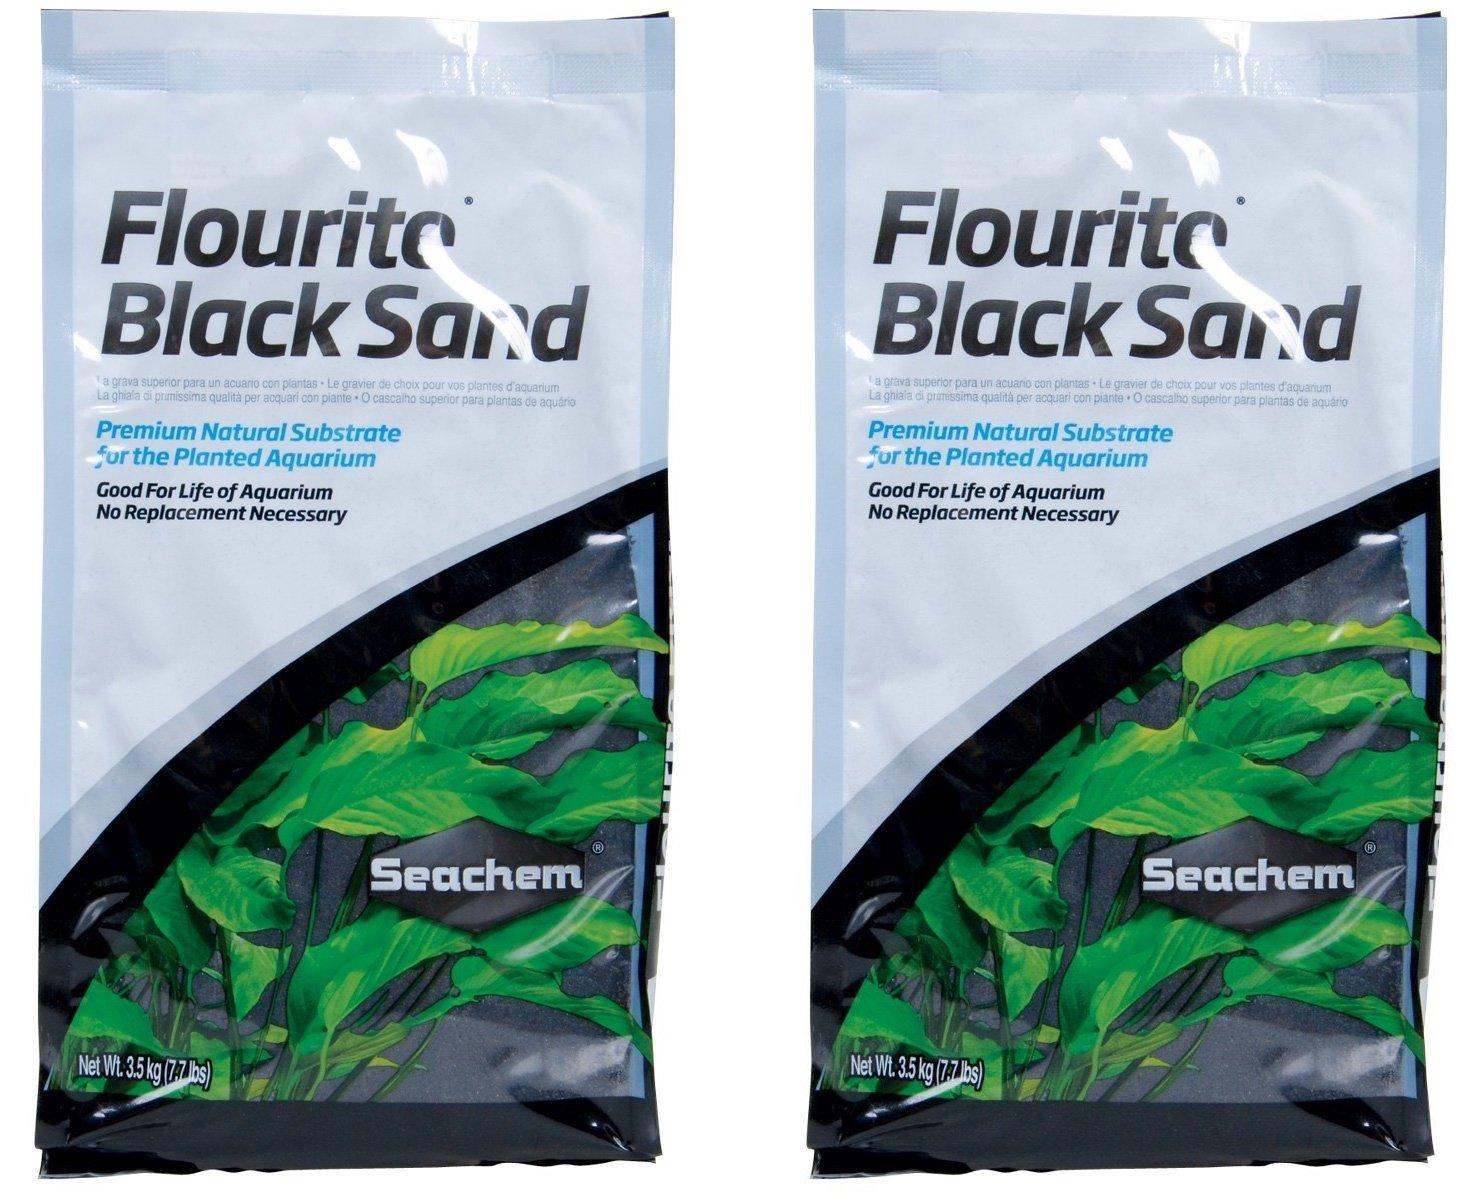 Seachem Fluorite Black Sand Substrate, 15.4lb Total (Two 7.7lb Bags) by Seachem